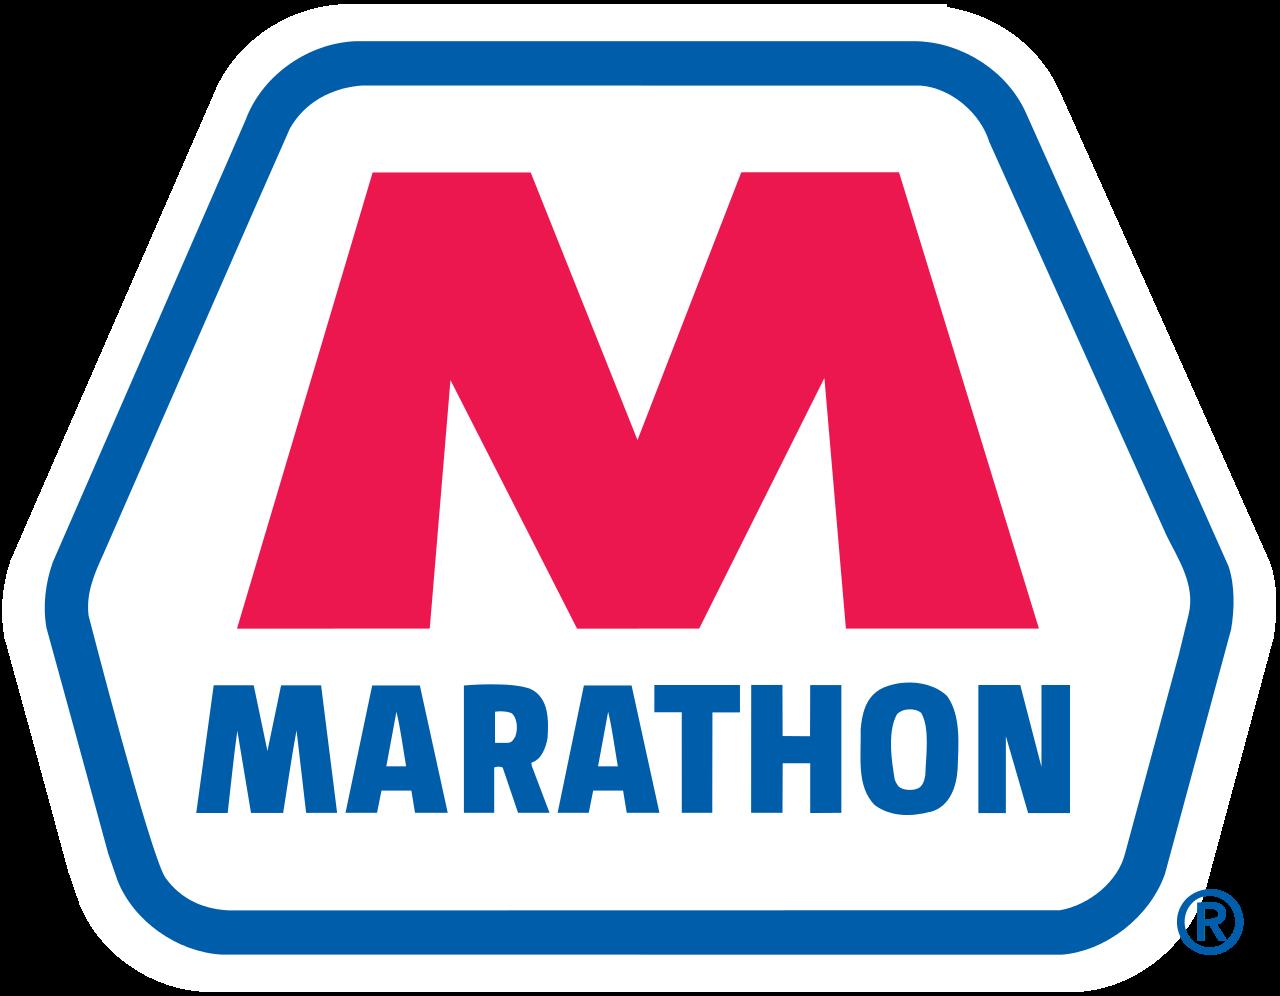 Marathon_Oil_logo